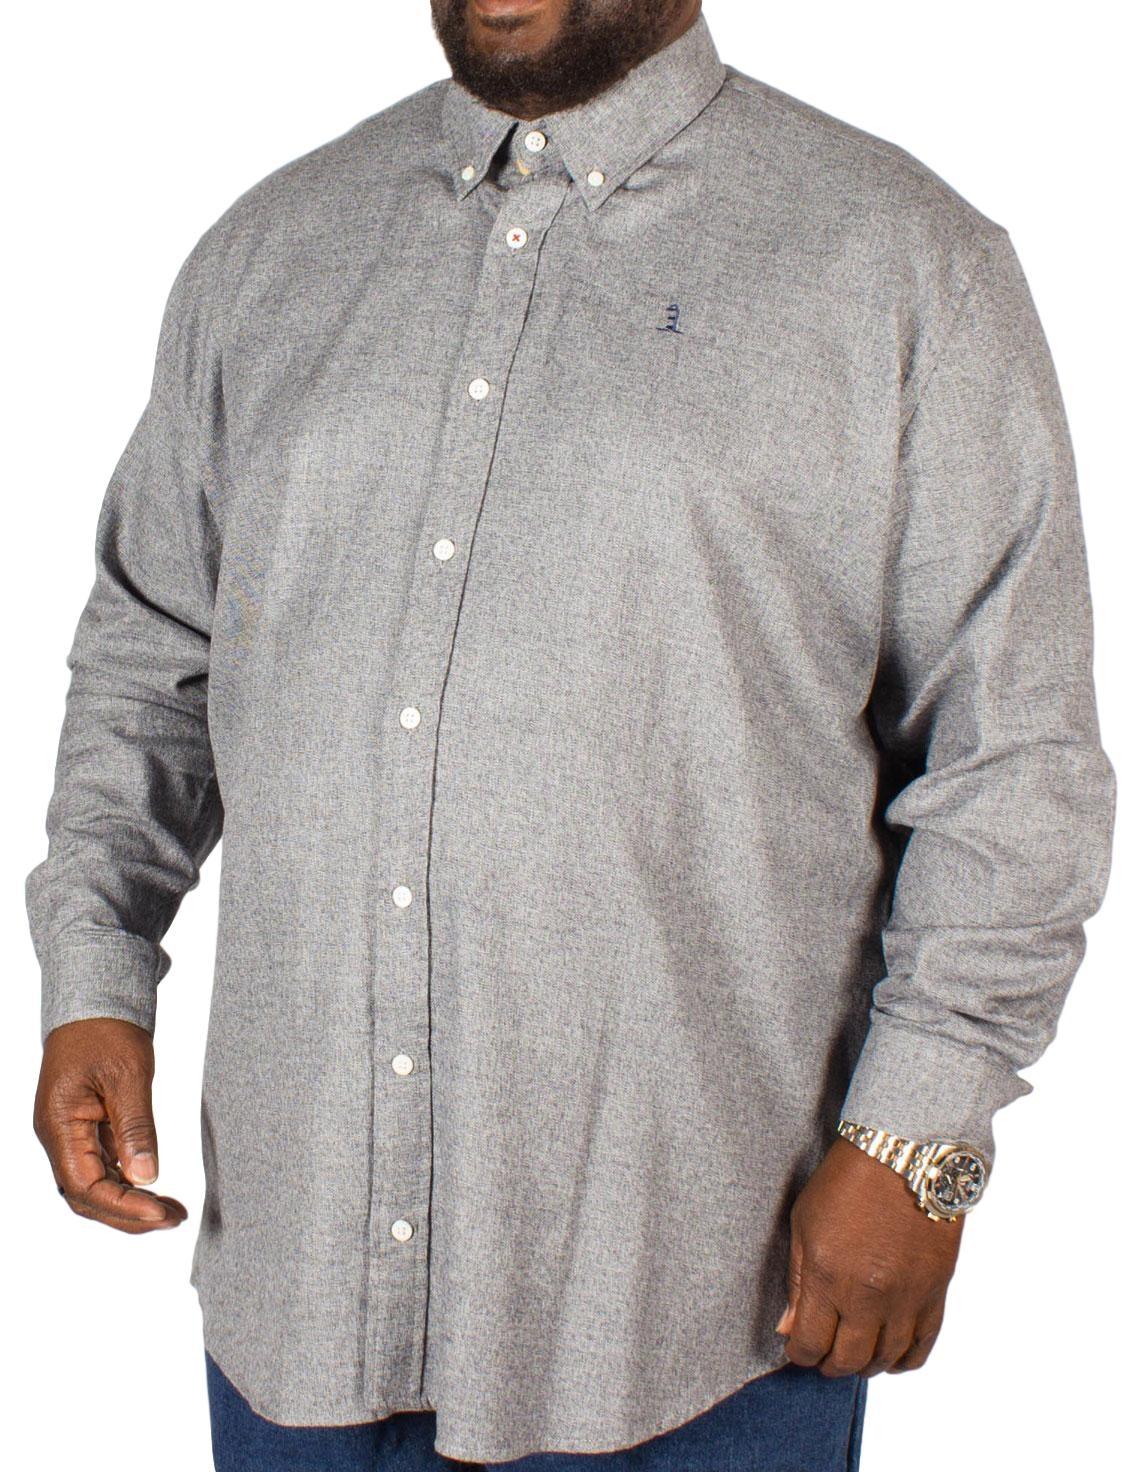 Replika Long Sleeve Plain Shirt Grey